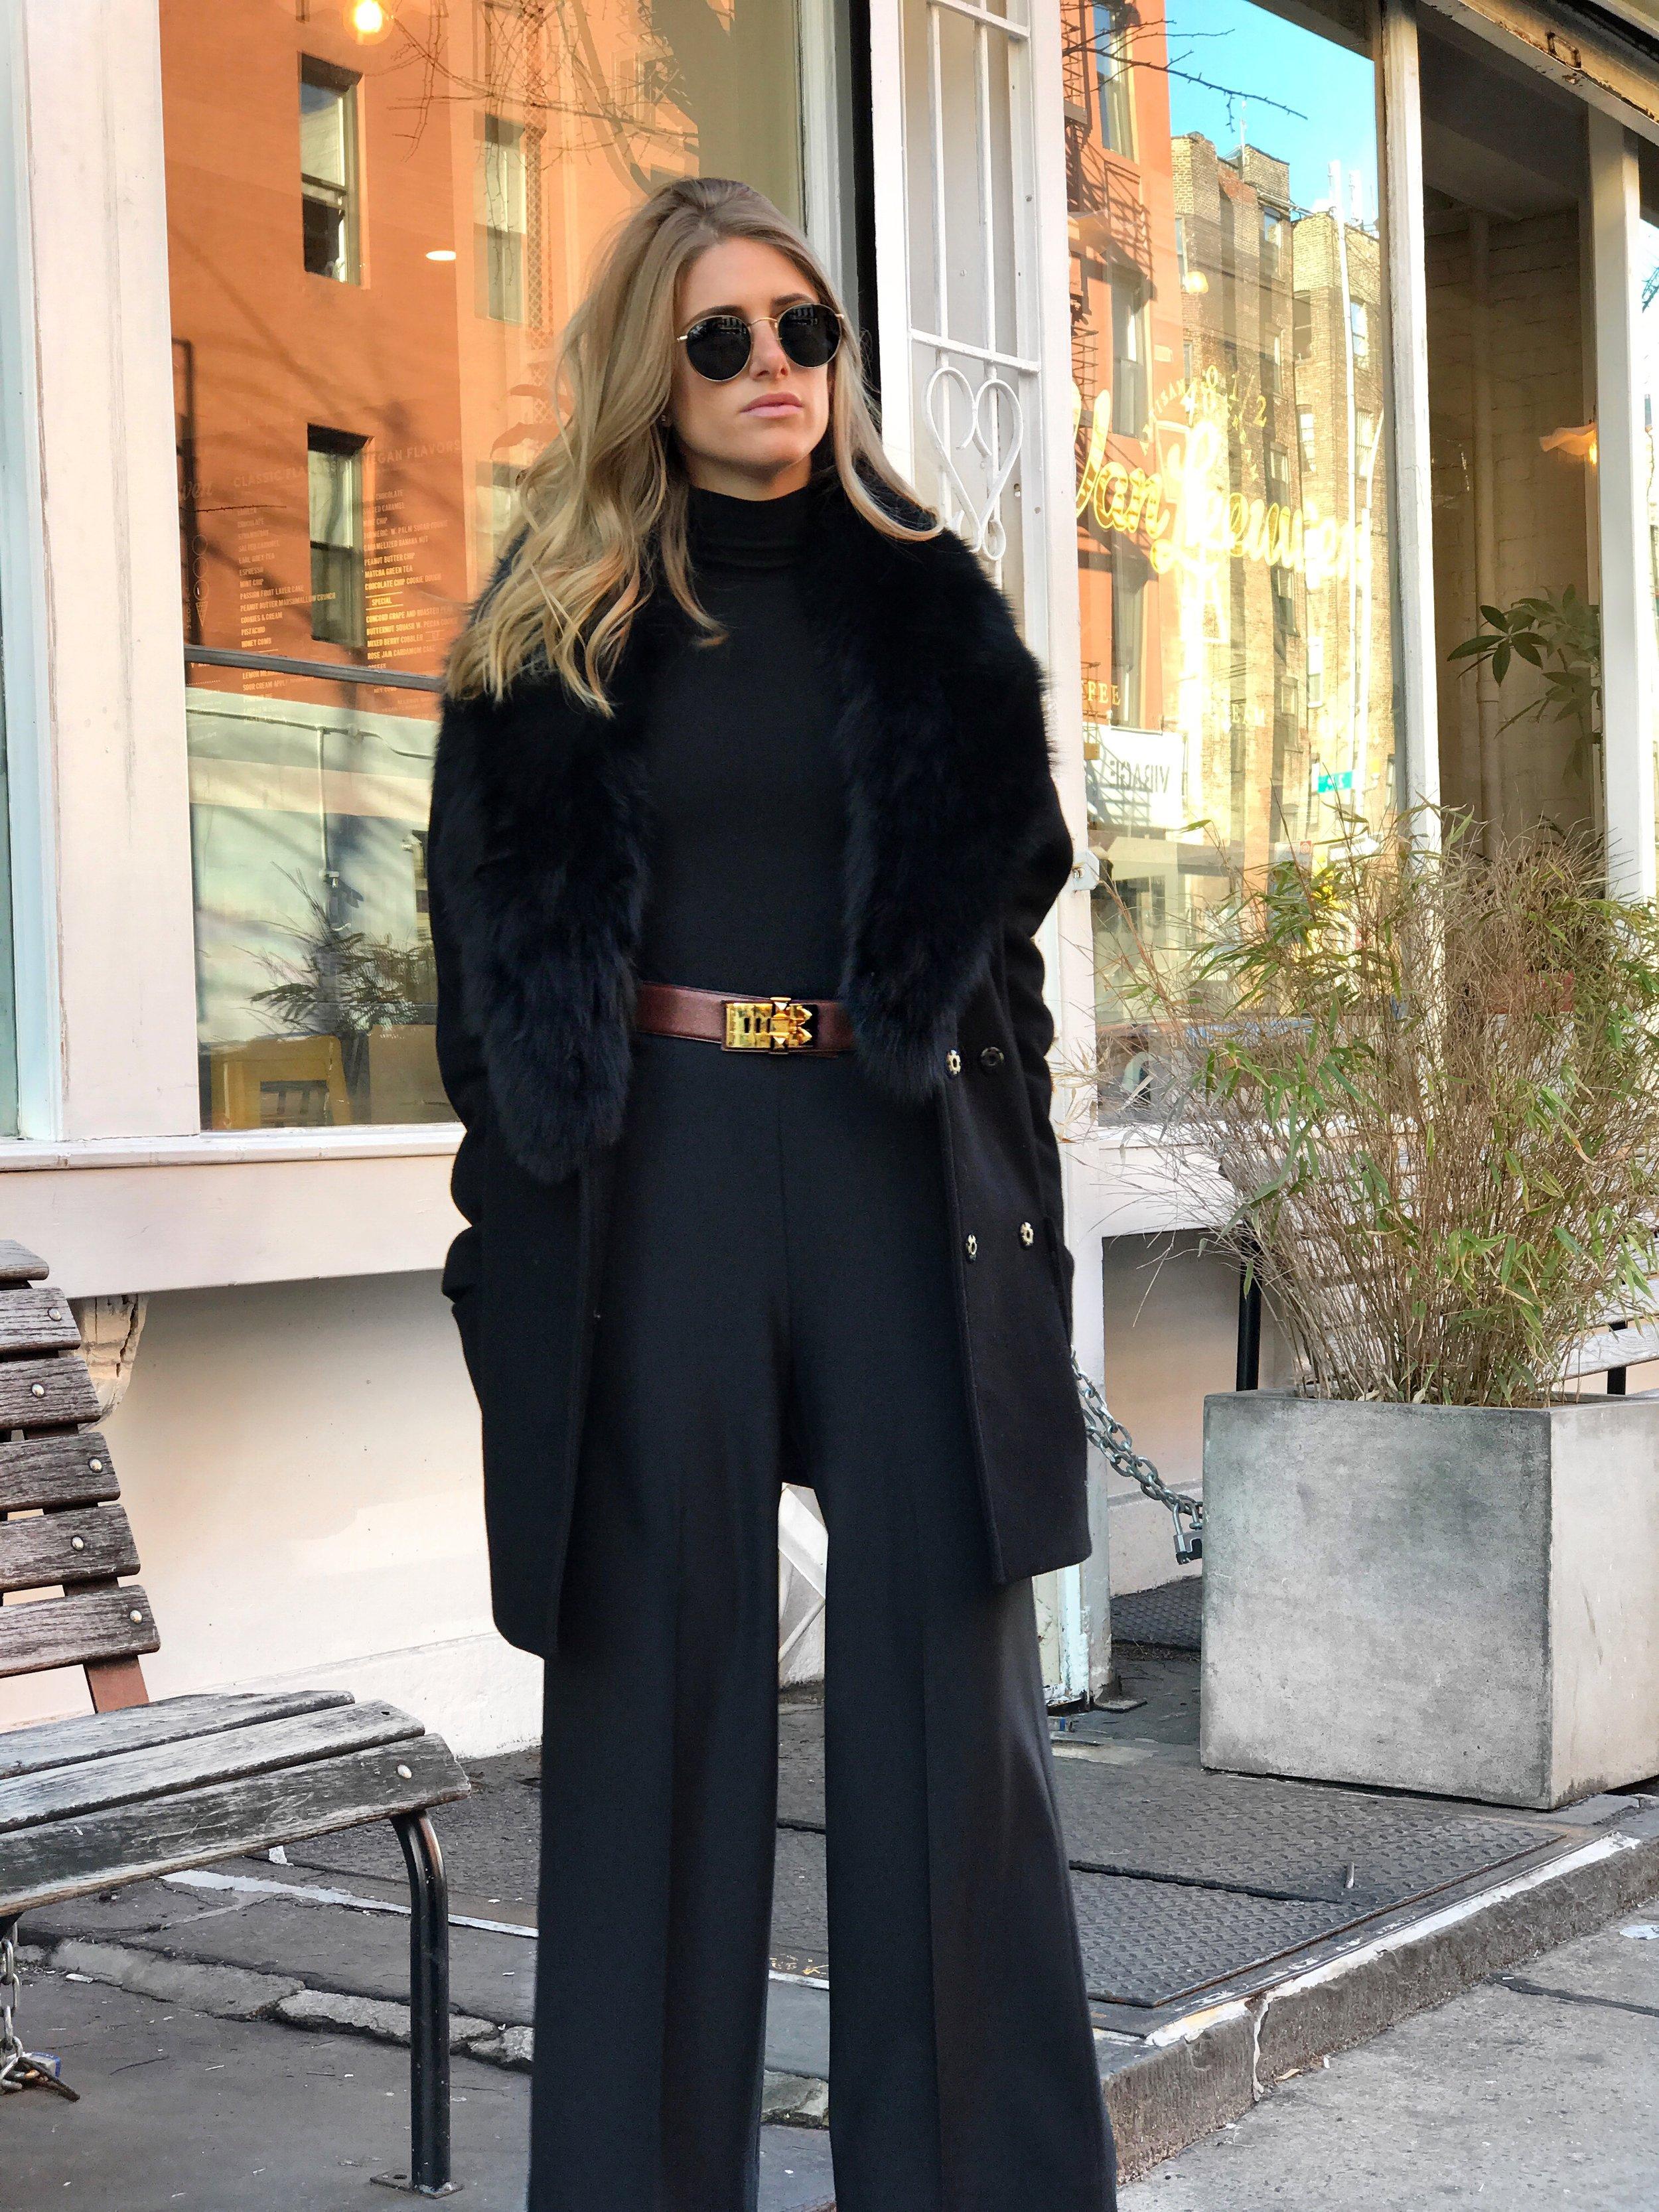 Zara Culottes (similar), $49.90